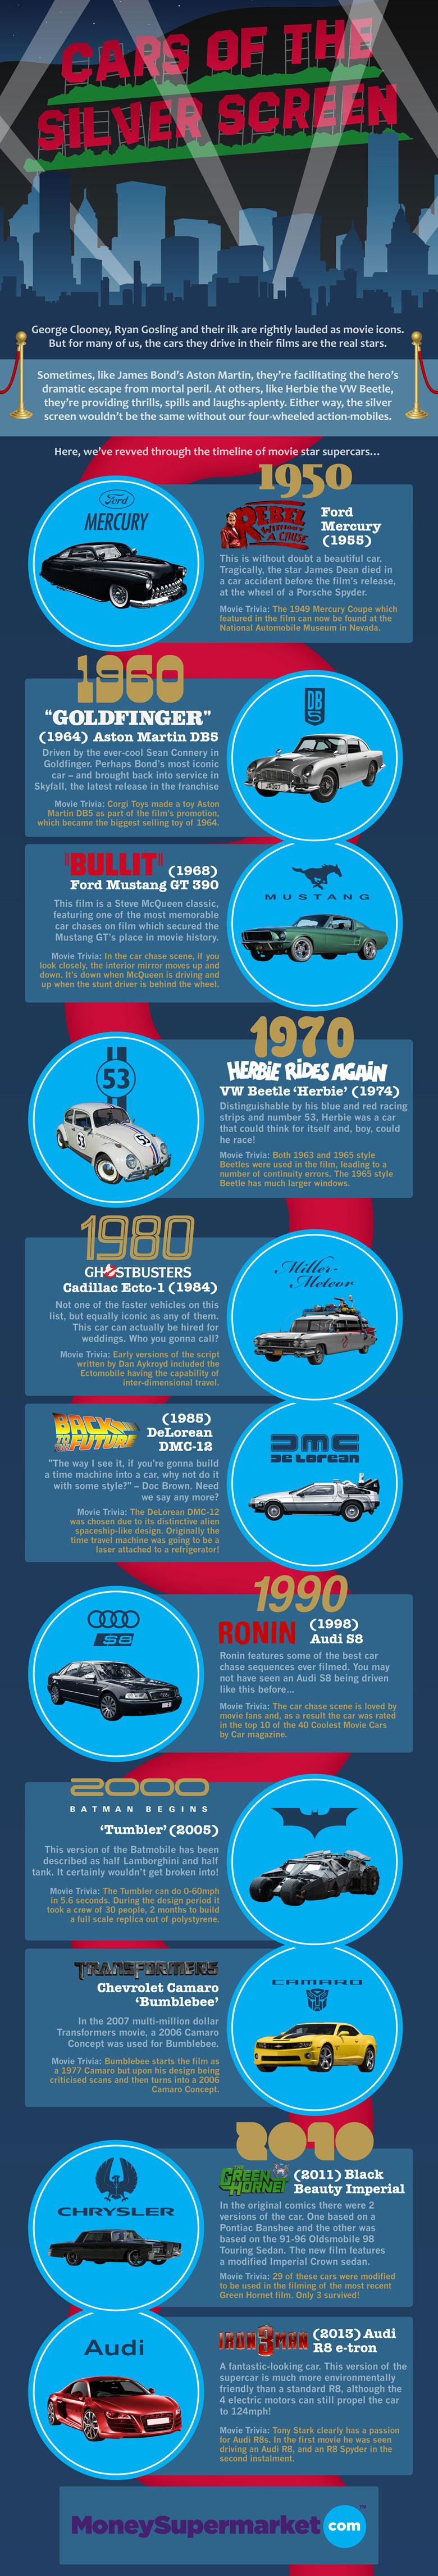 Legendary Film Cars-Infographic